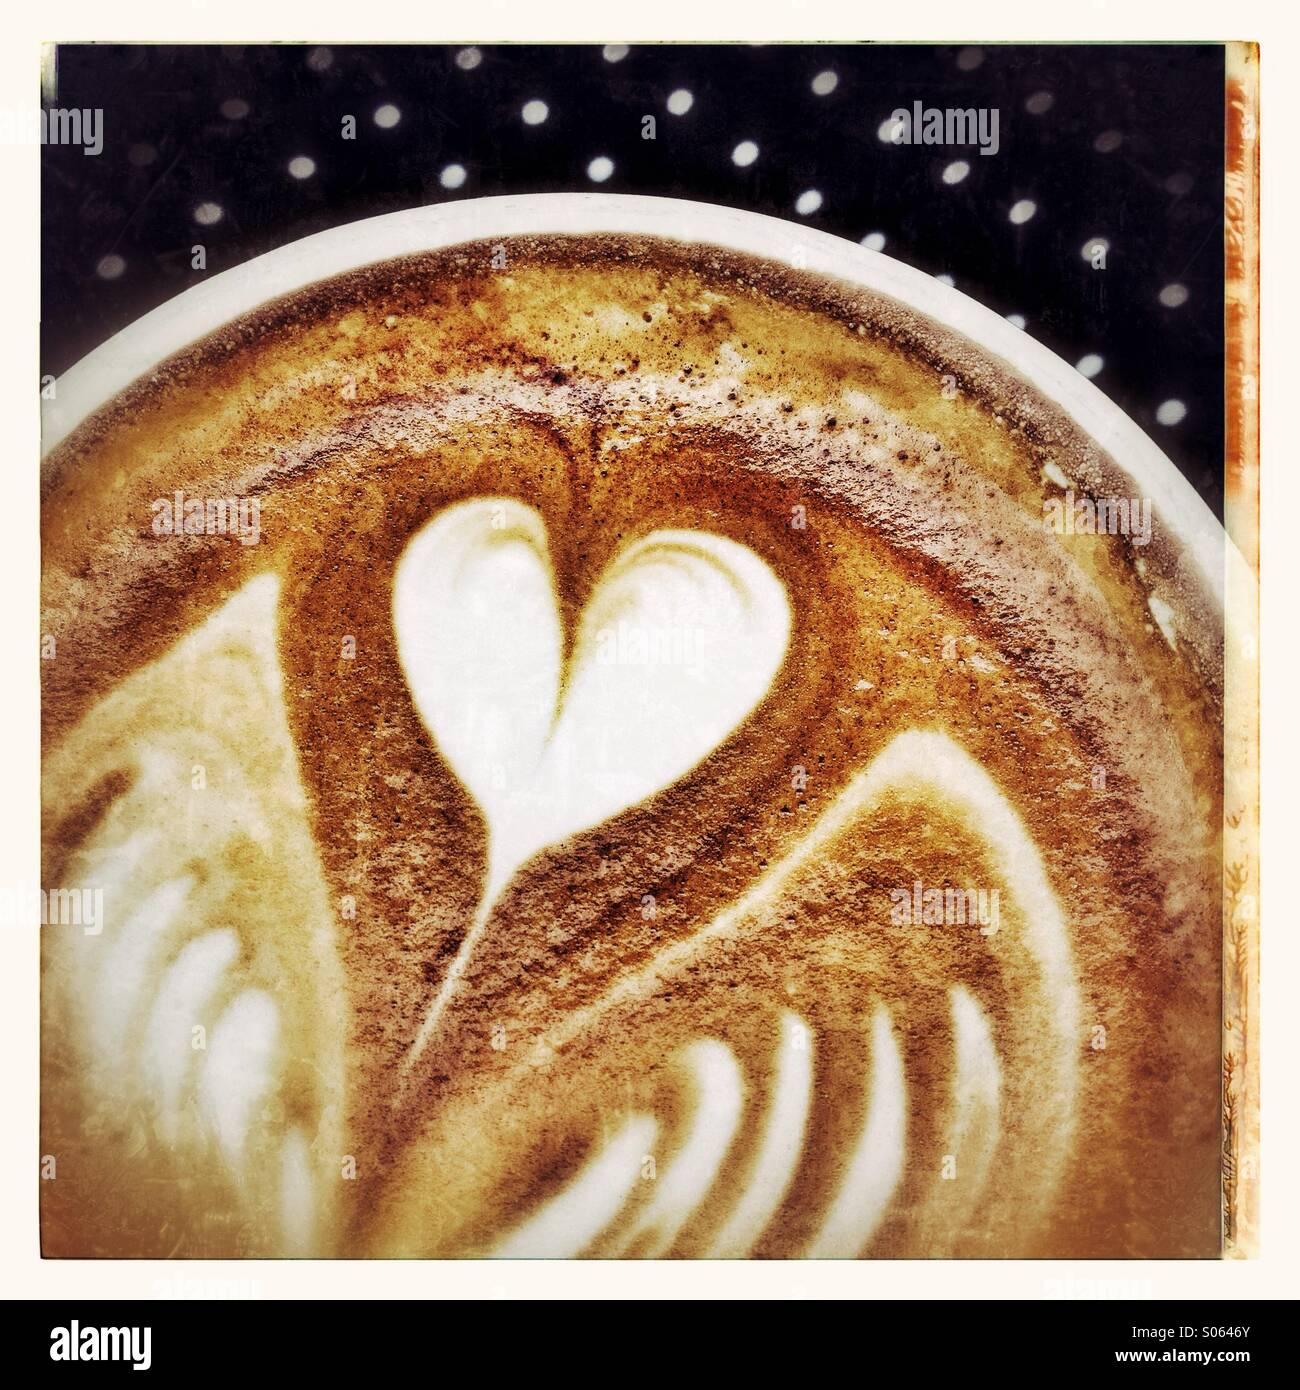 Latte - Stock Image